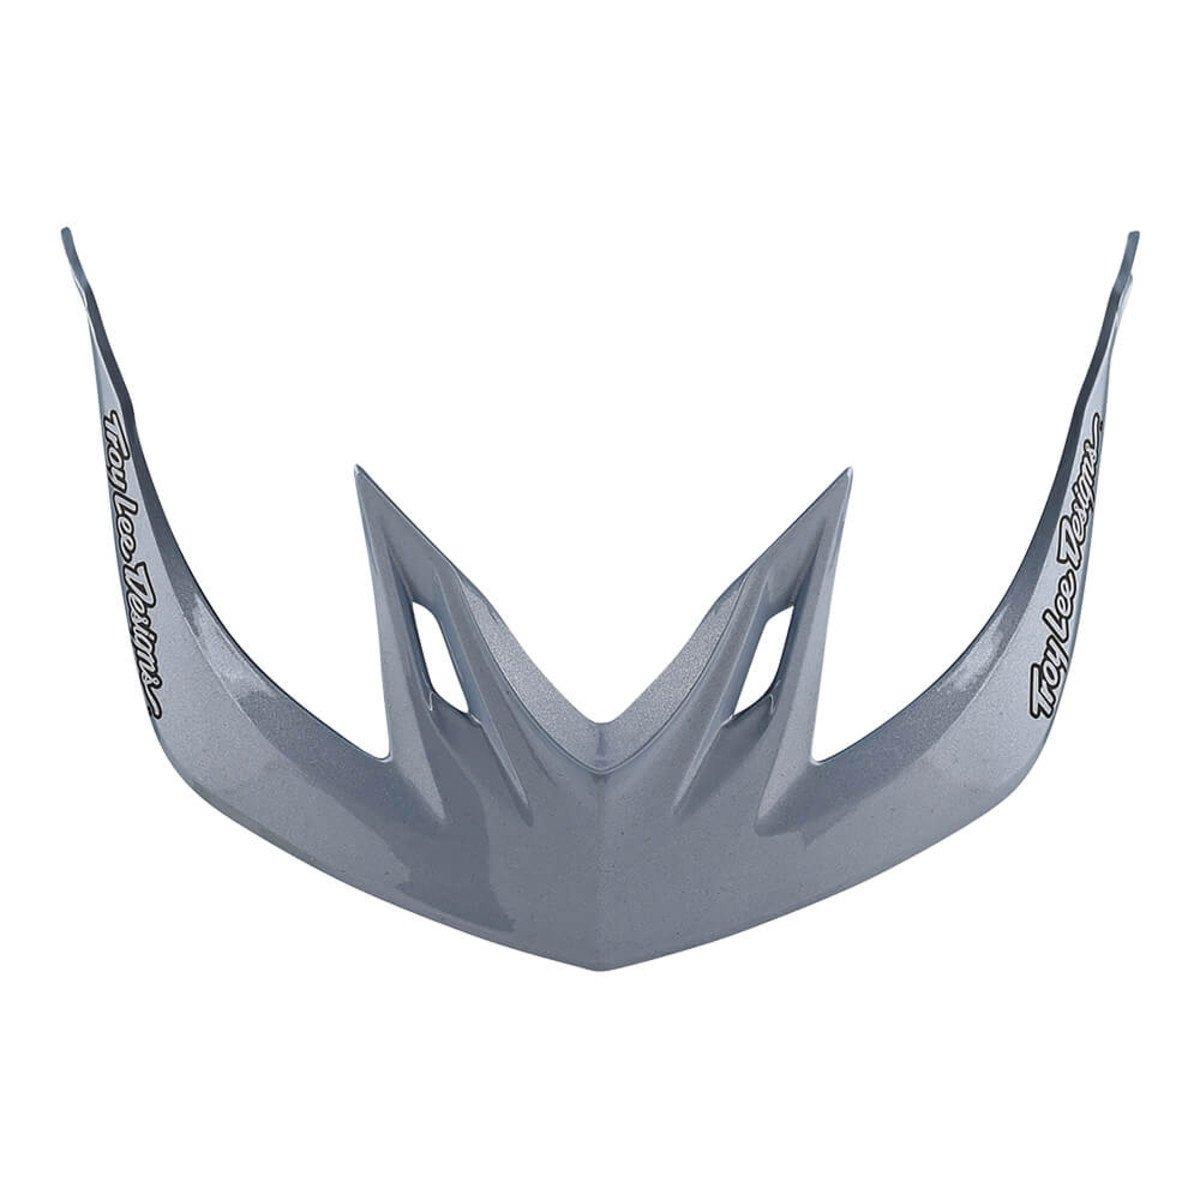 Ocean//One Size Troy Lee Designs 2018 A2 Starburst Visor Off-Road BMX Cyling Helmet Accessories